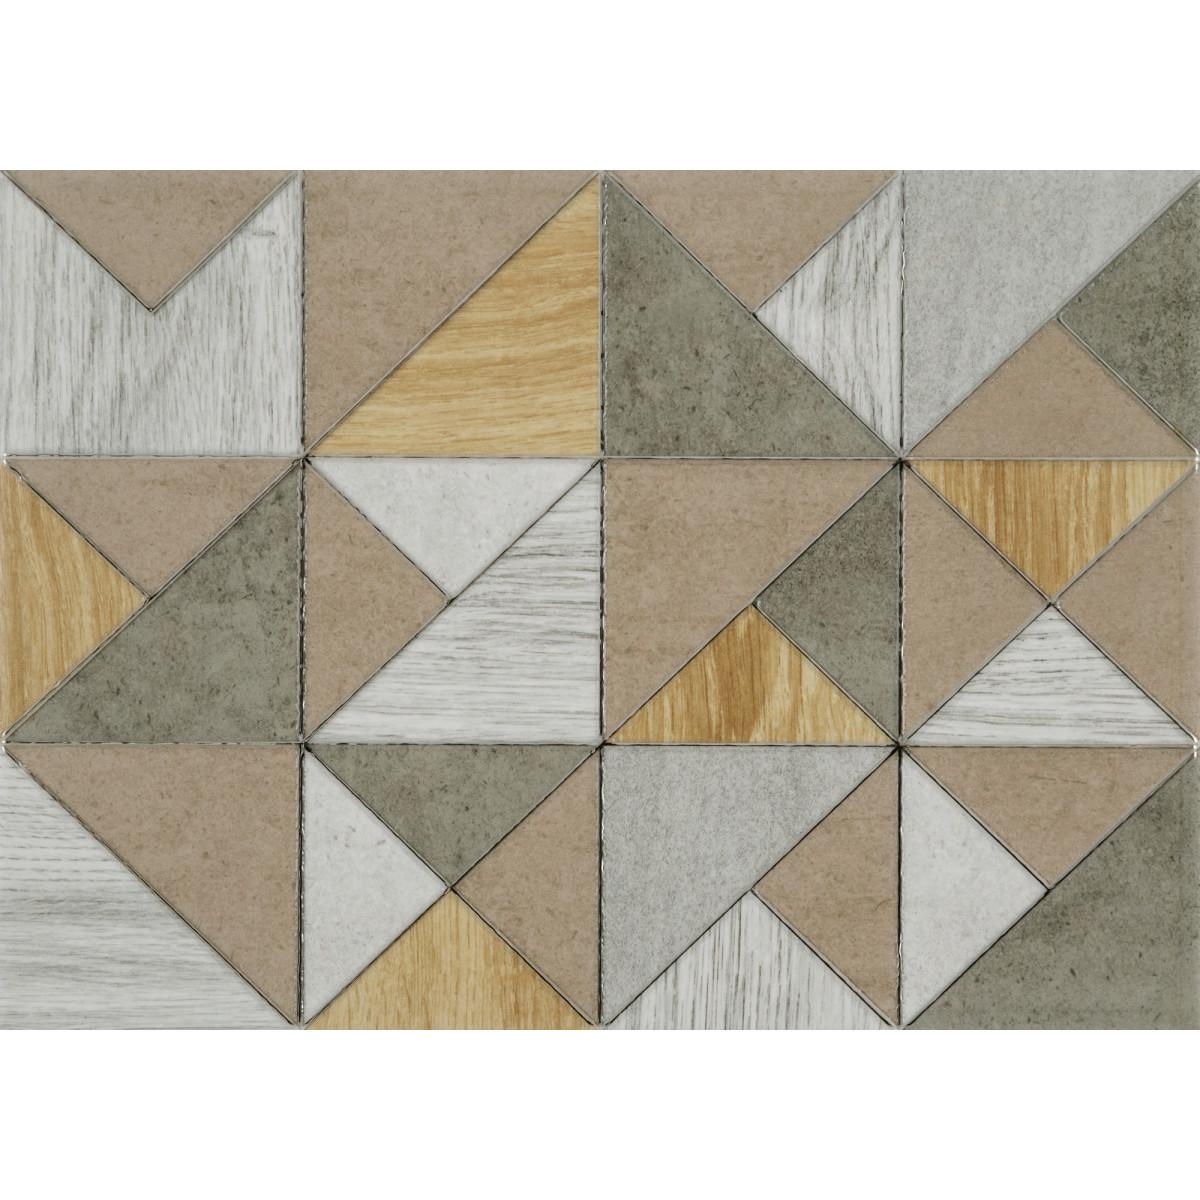 Декор Wood «Калейдо» 35x25 см 2 шт.